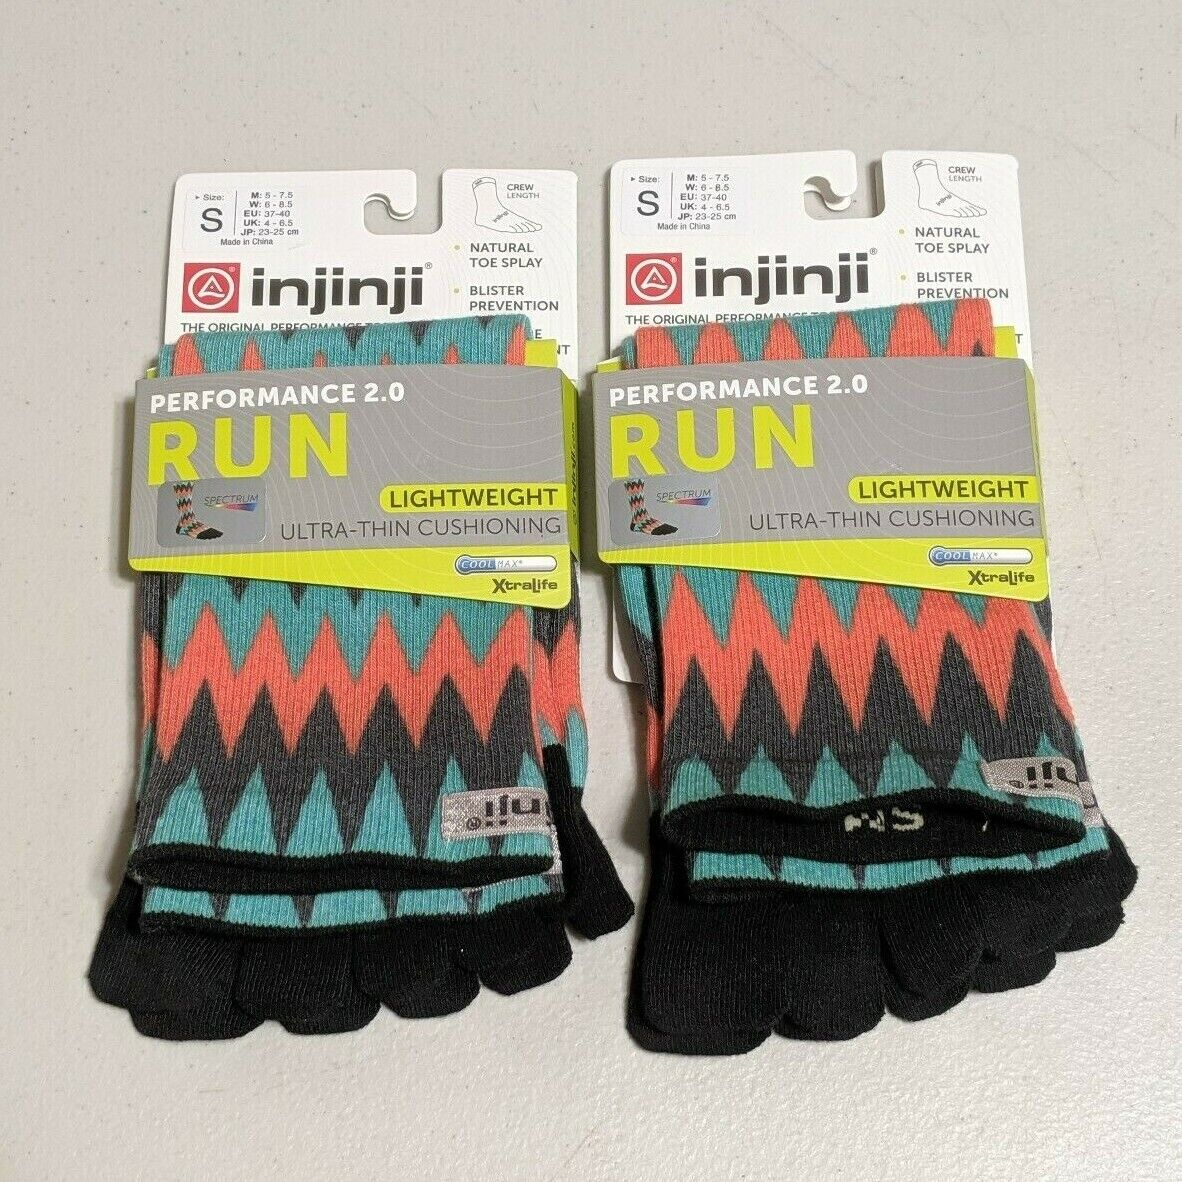 Lot of 2 Pair Injinji Run Lightweight Crew Toe Socks Colorfu